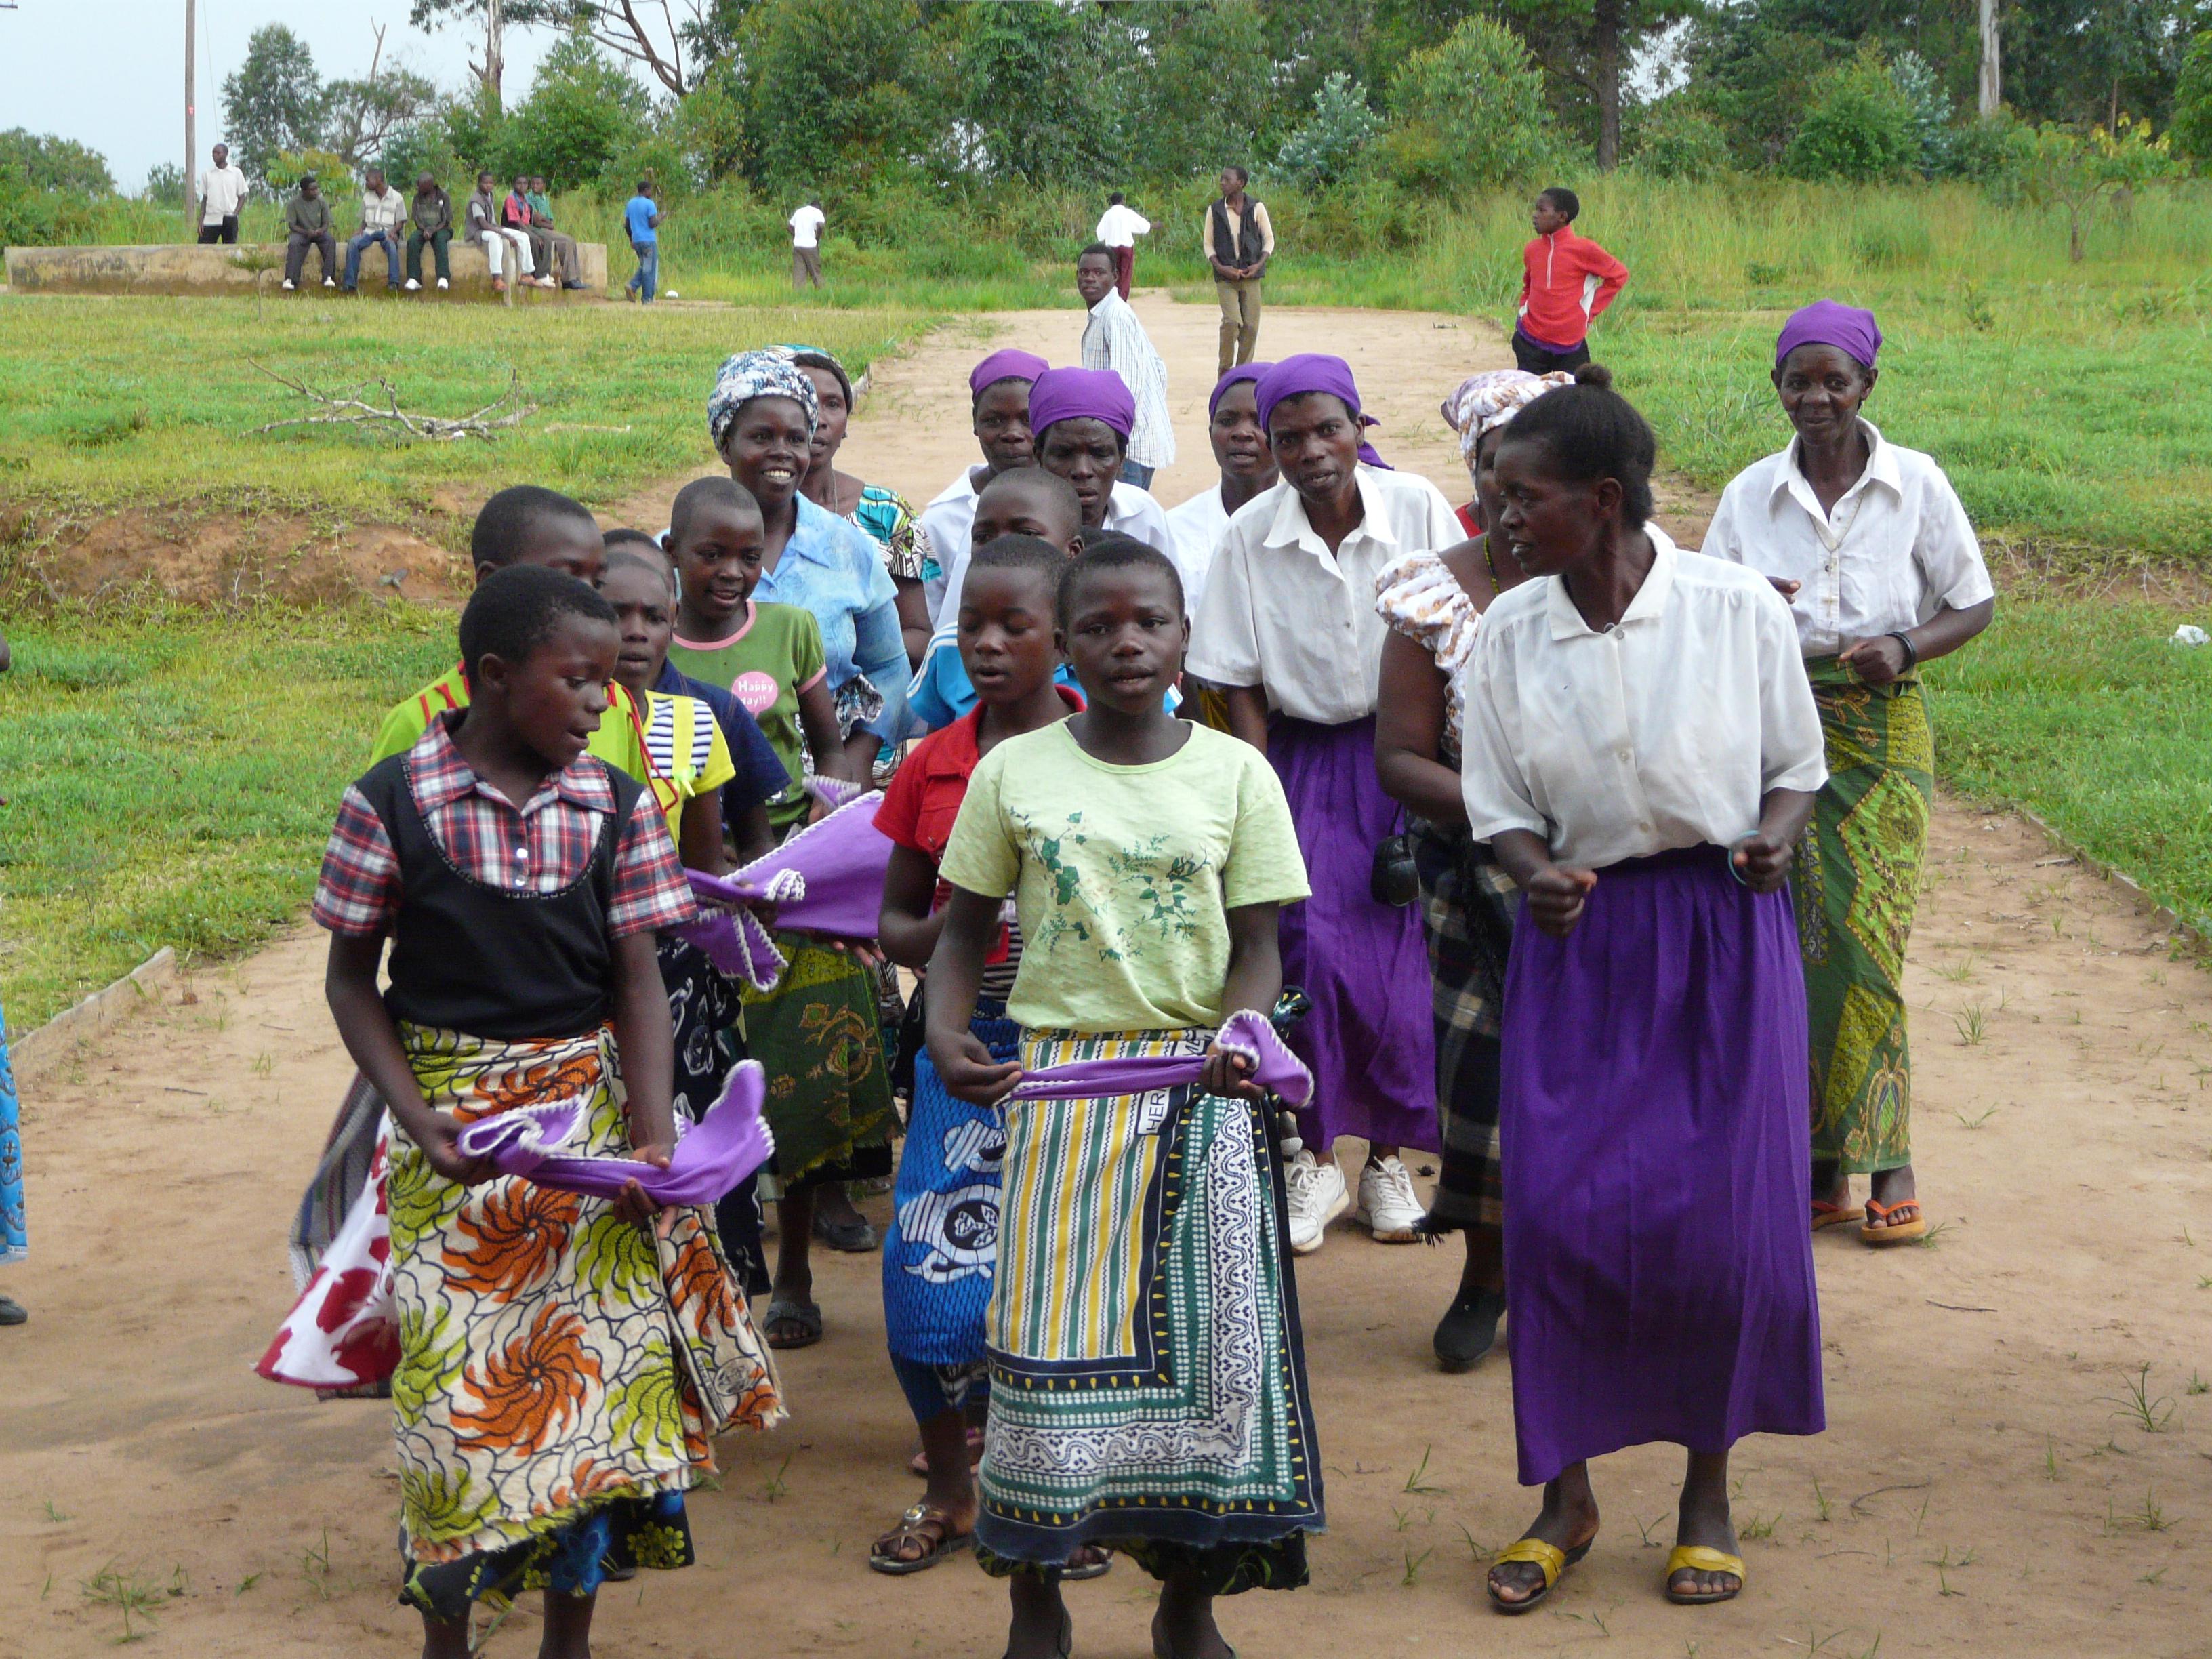 Malawi 2010-Tc-1 181